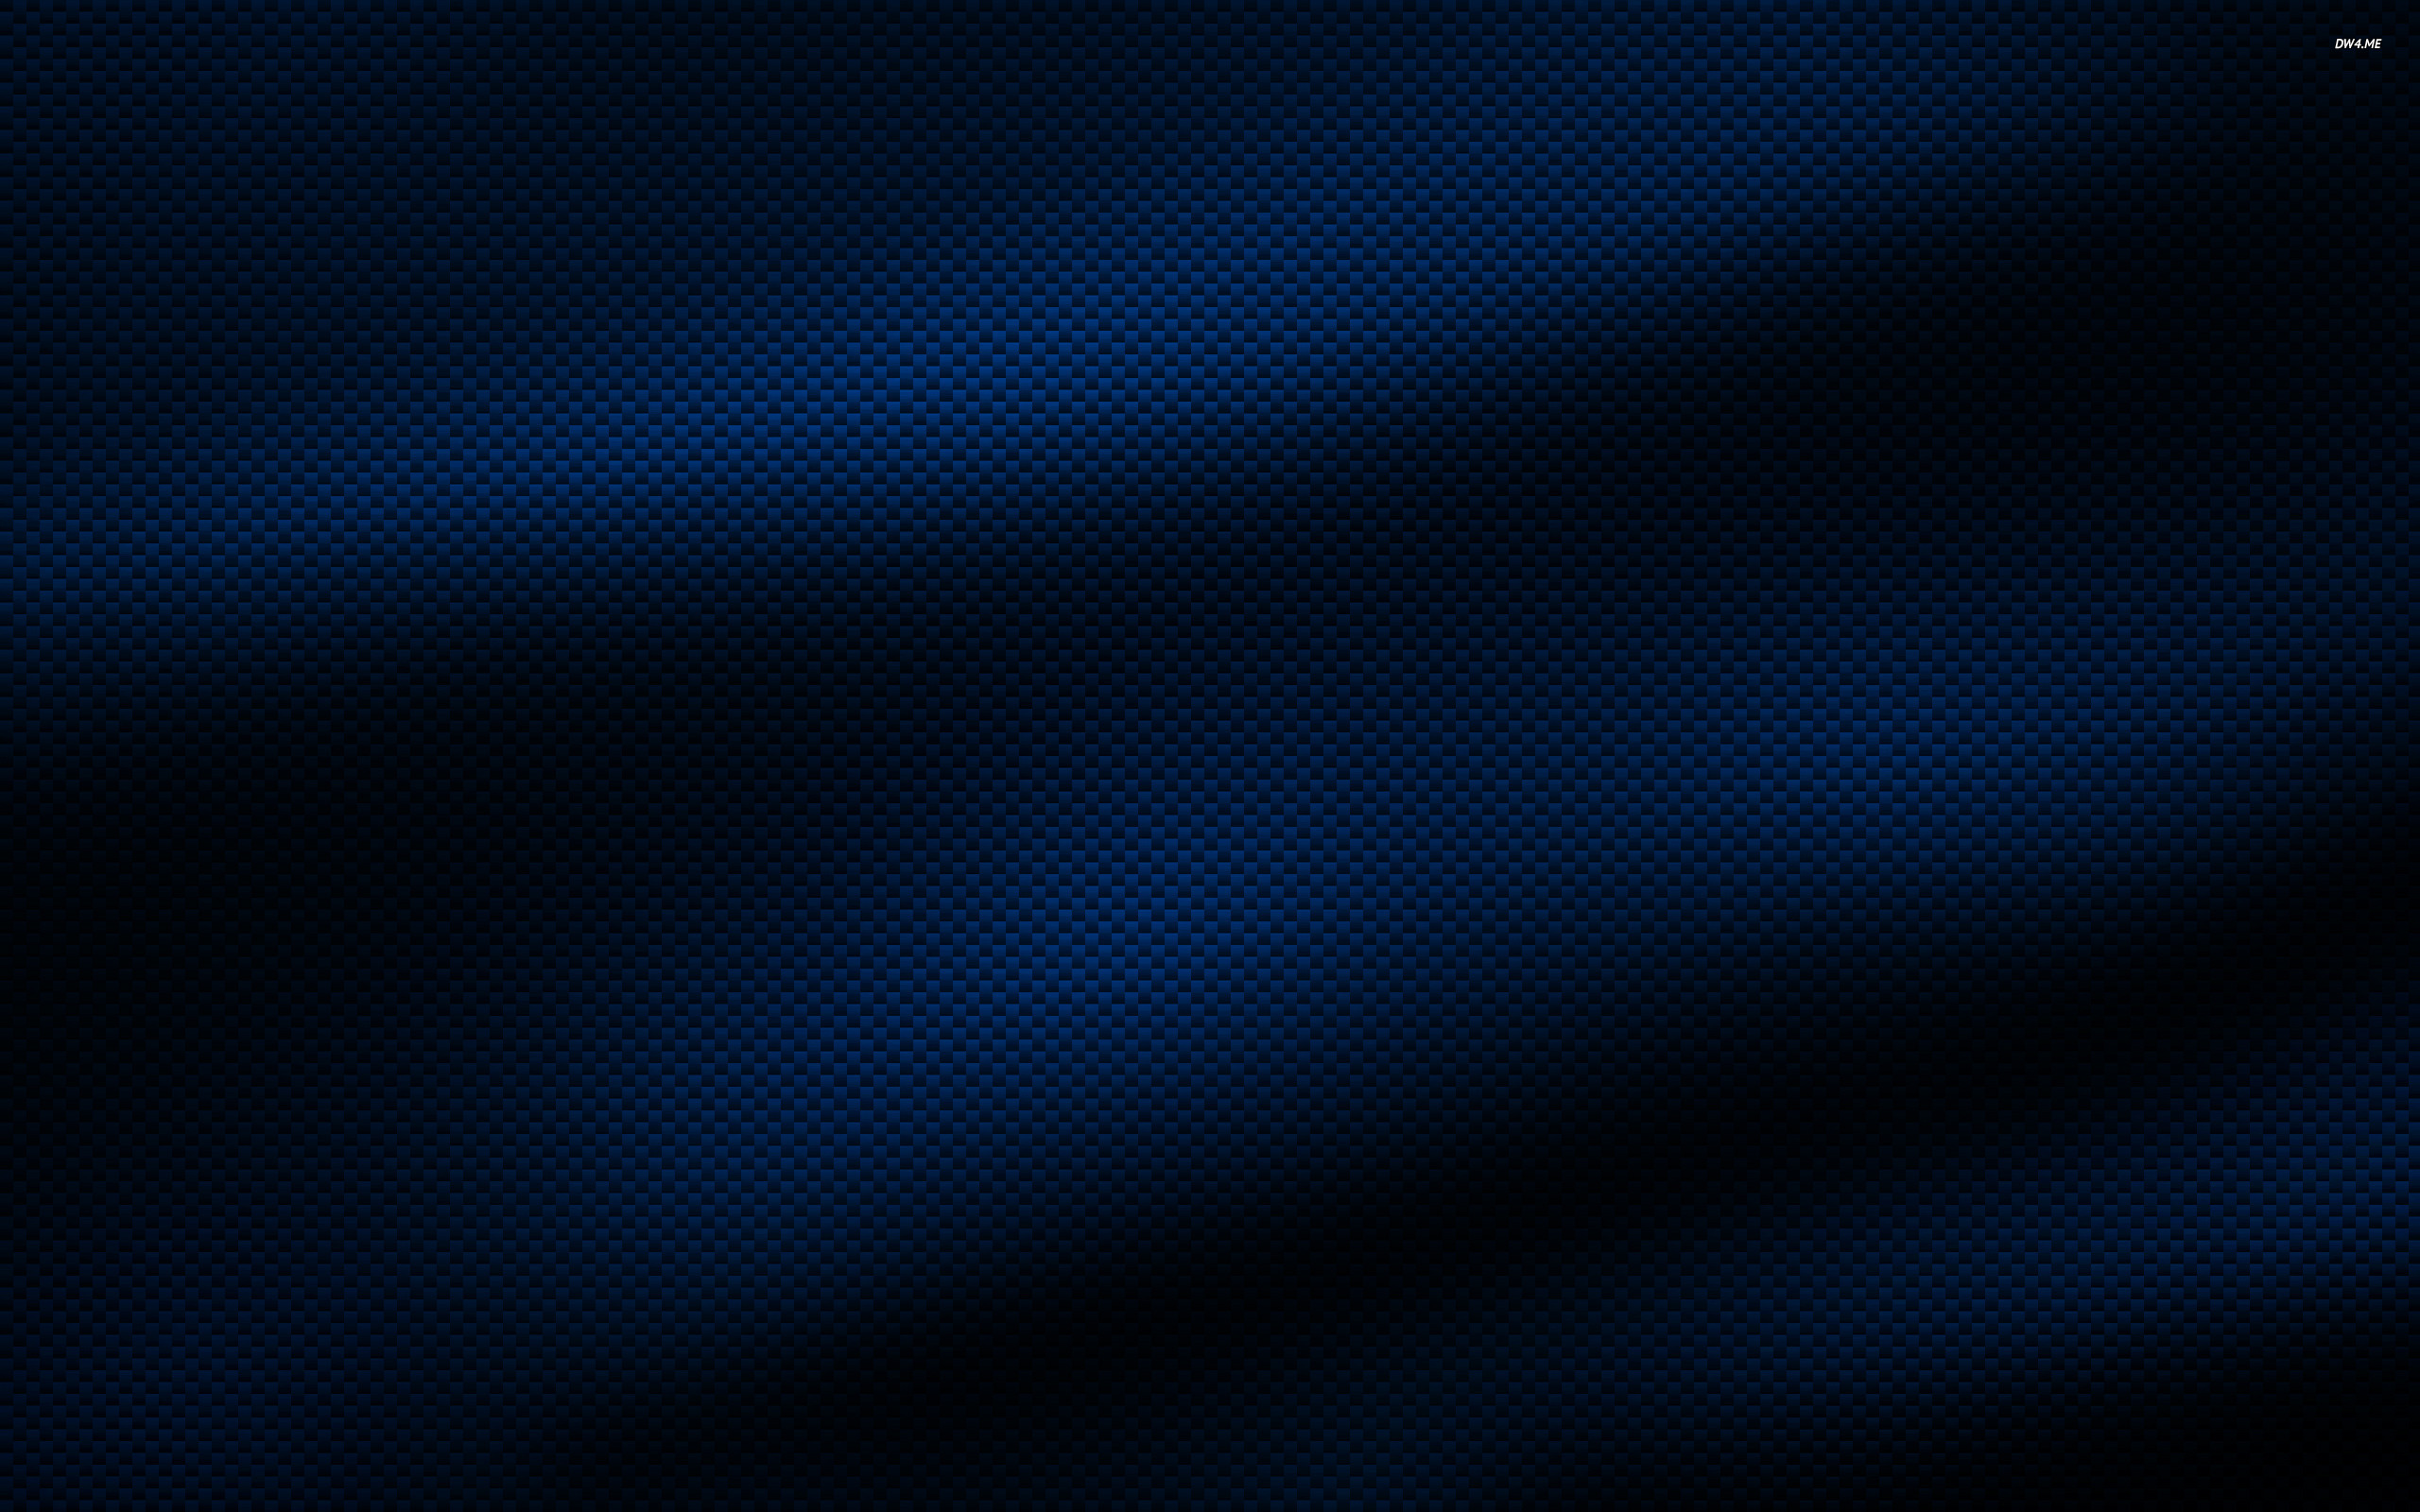 Abstract Wallpaper Fabric Carbon Wallpapers Fiber fond ecran hd 2560x1600